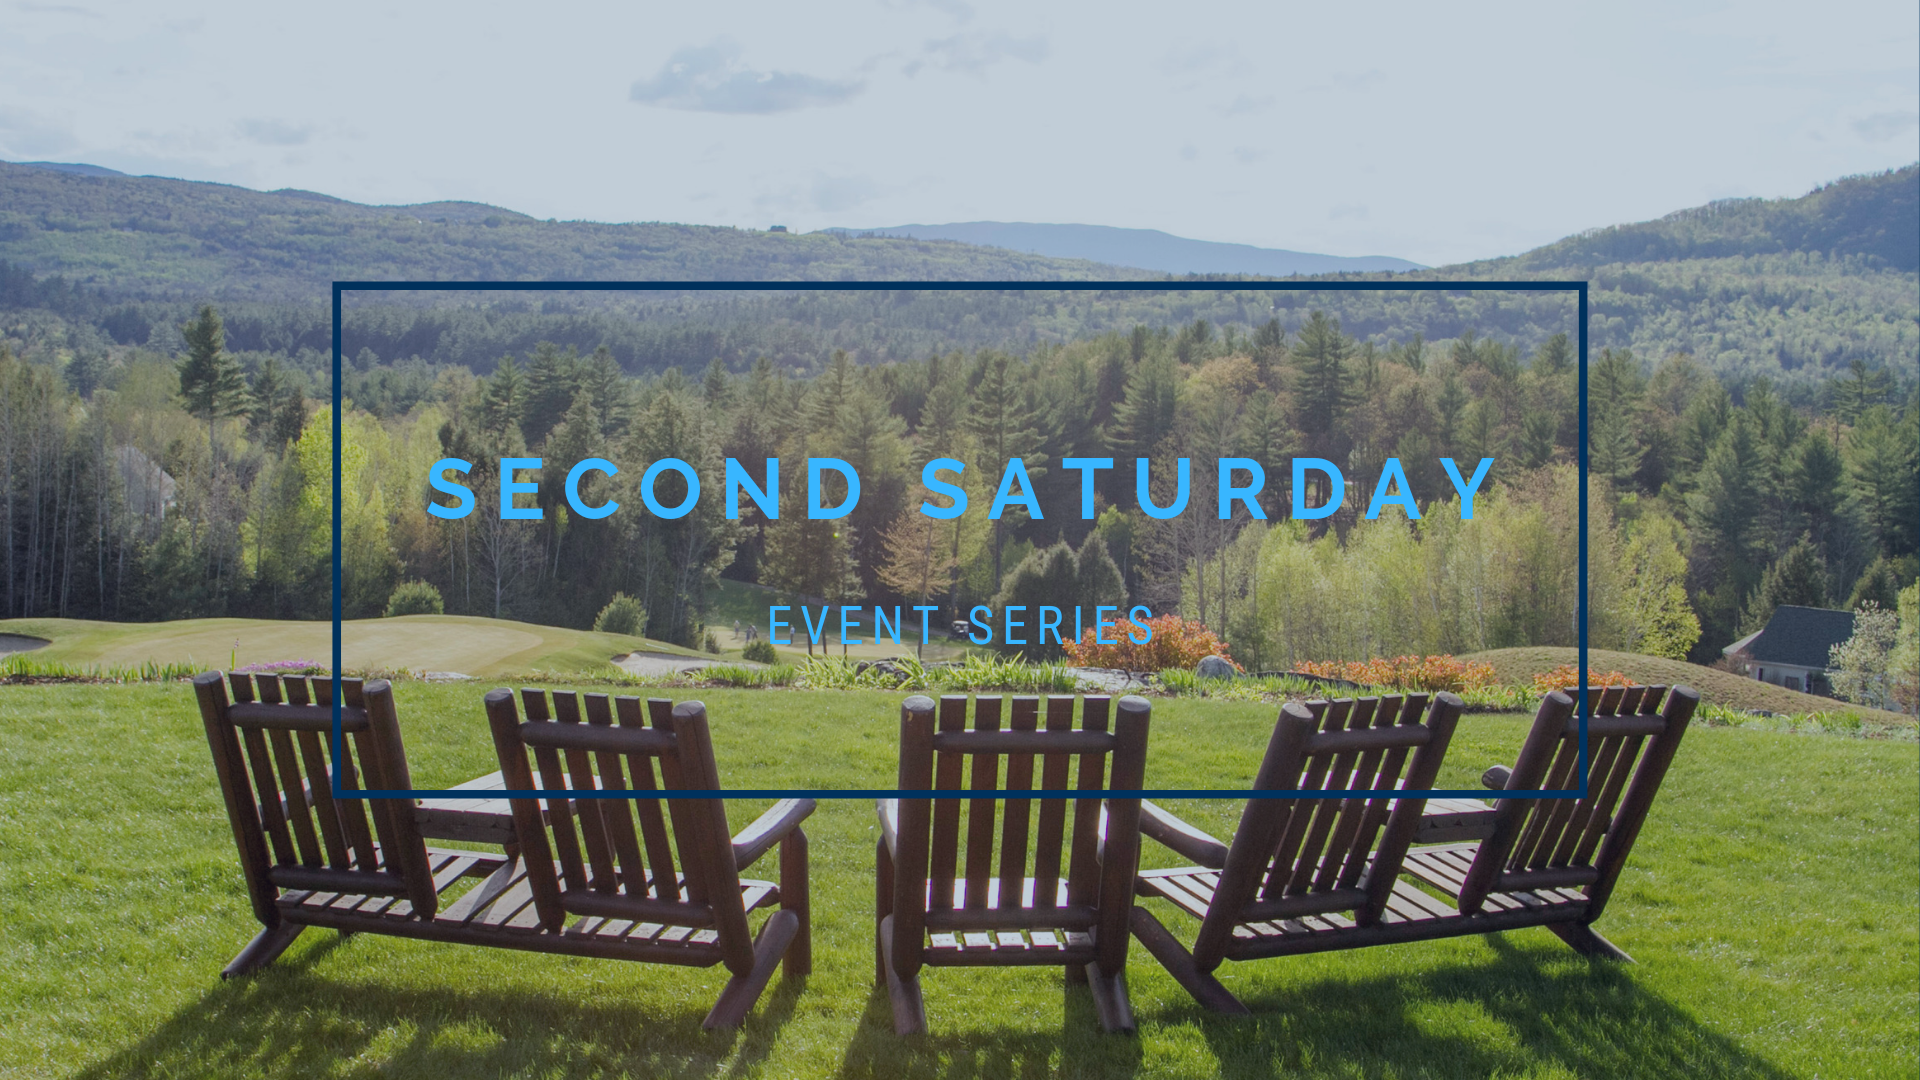 Second Saturday Event Series